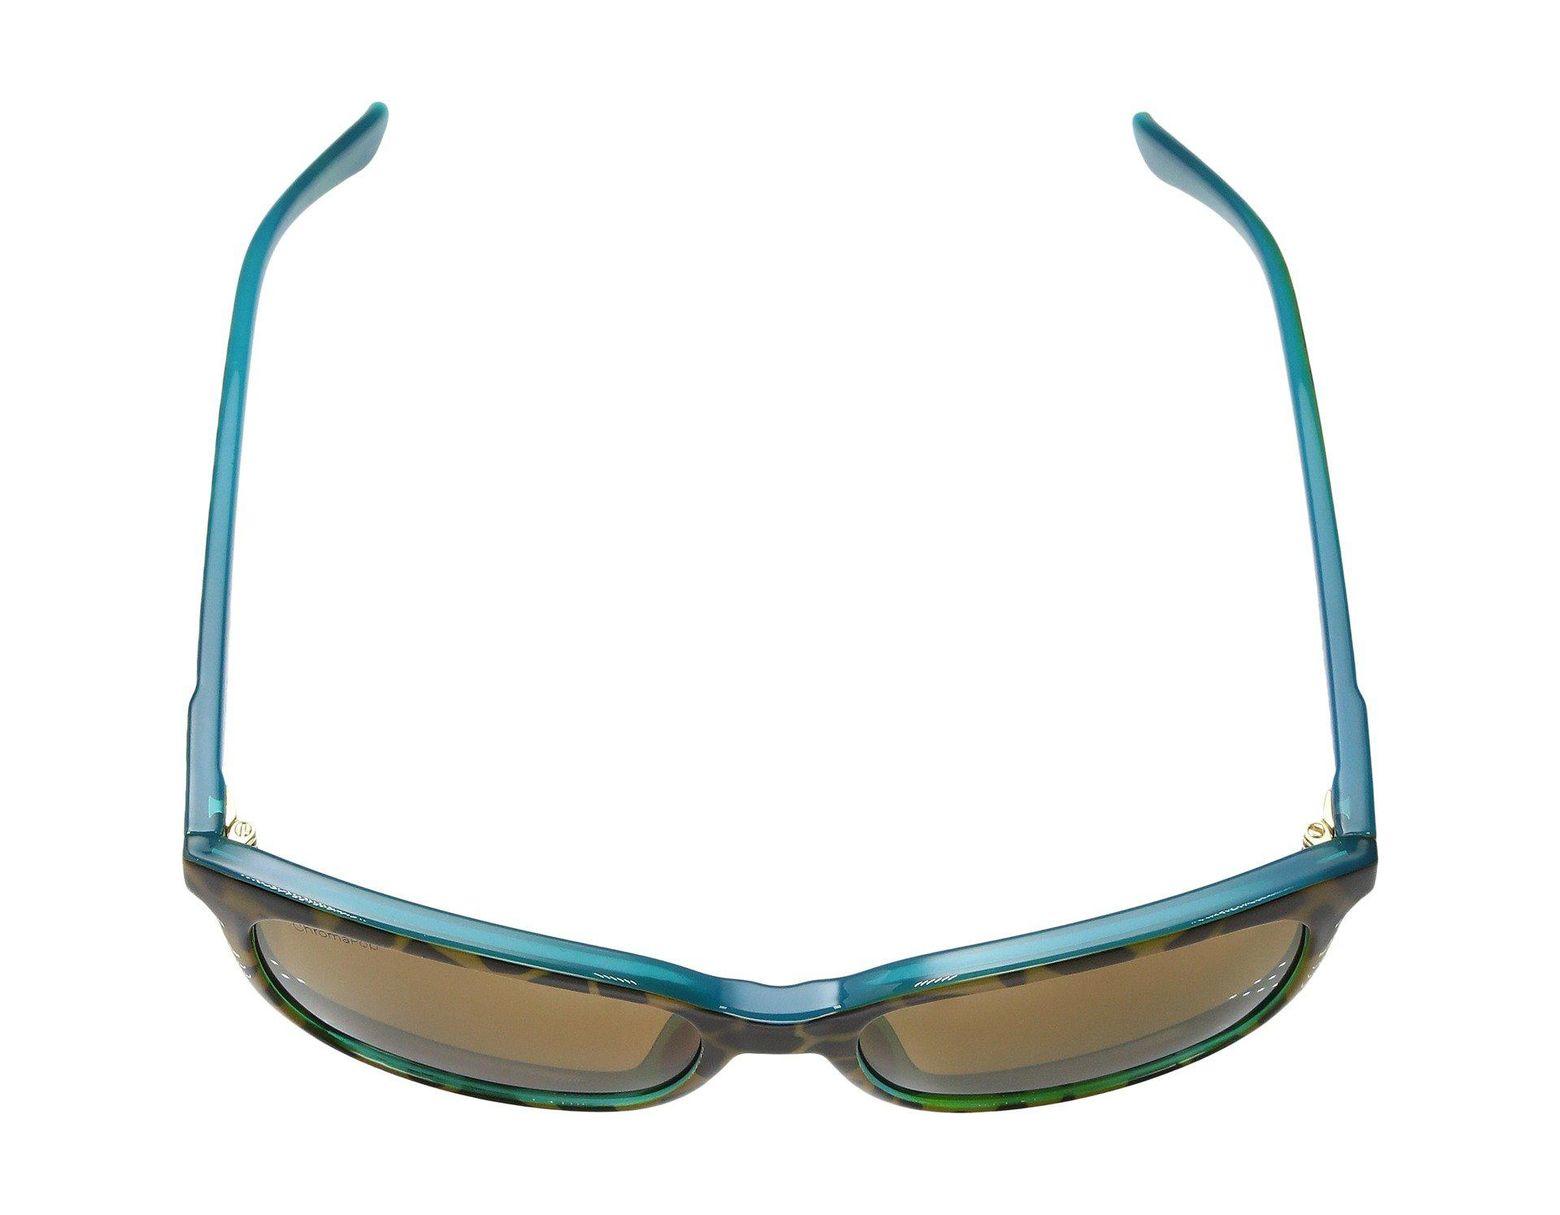 d0386e7e72 Smith Optics Colette (tortoise Marine chromapop Polarized Brown Lens)  Fashion Sunglasses in Blue - Lyst